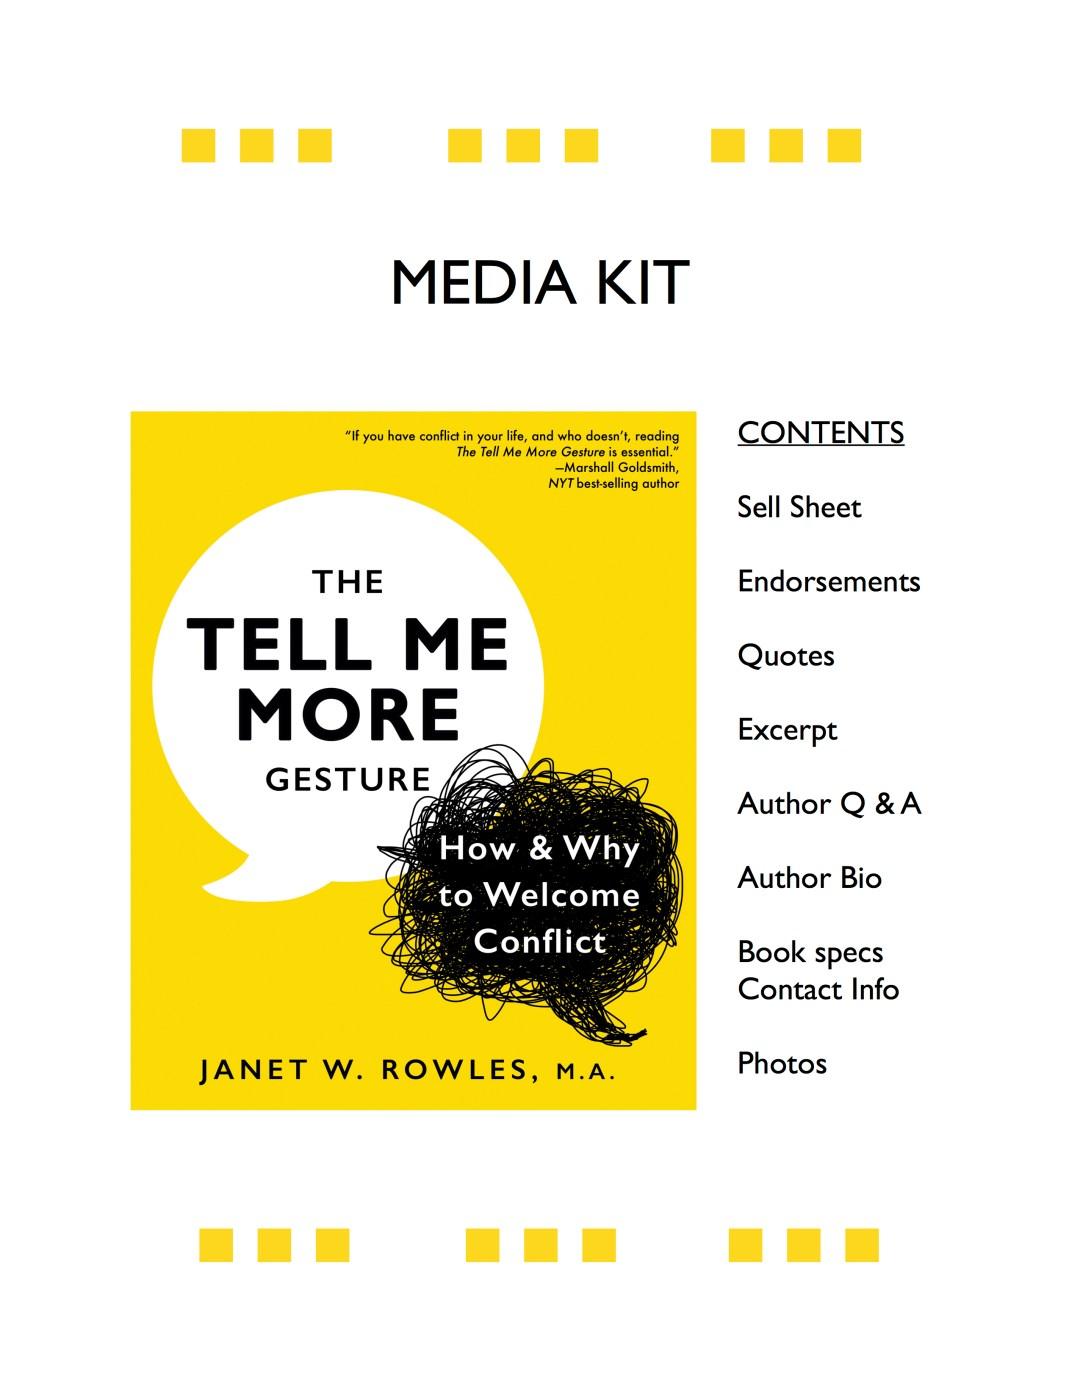 TMMG Media Kit Cover